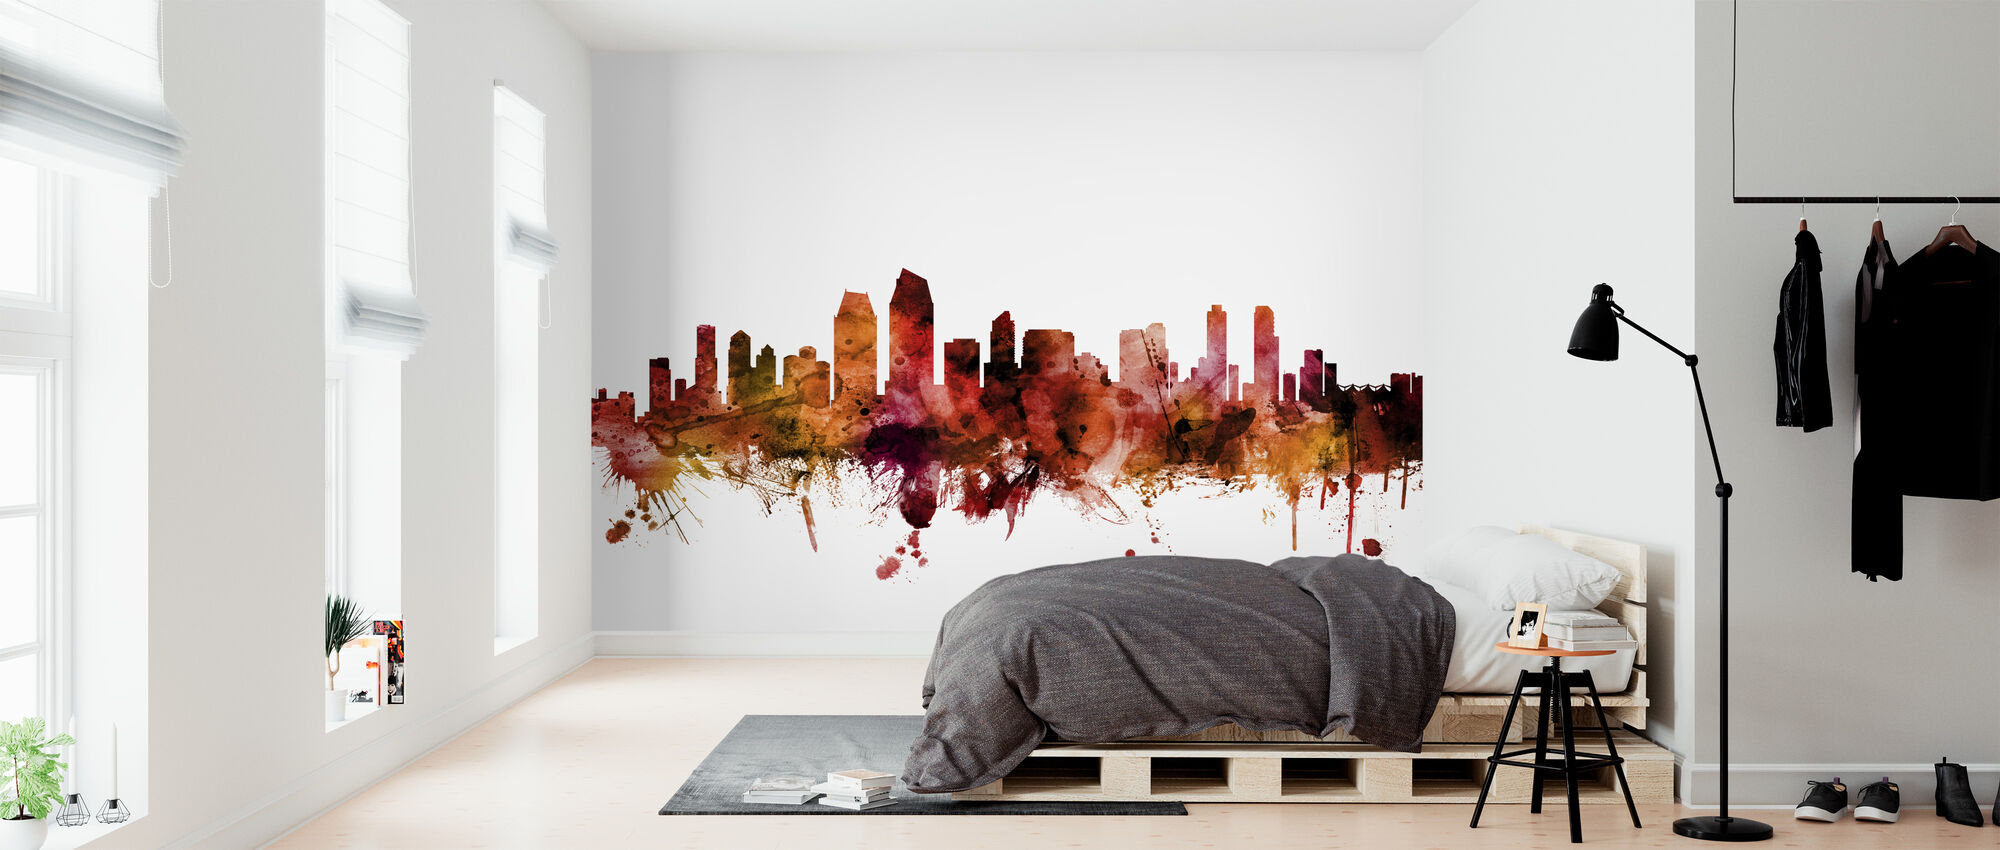 San Diego California Skyline - Wallpaper - Bedroom